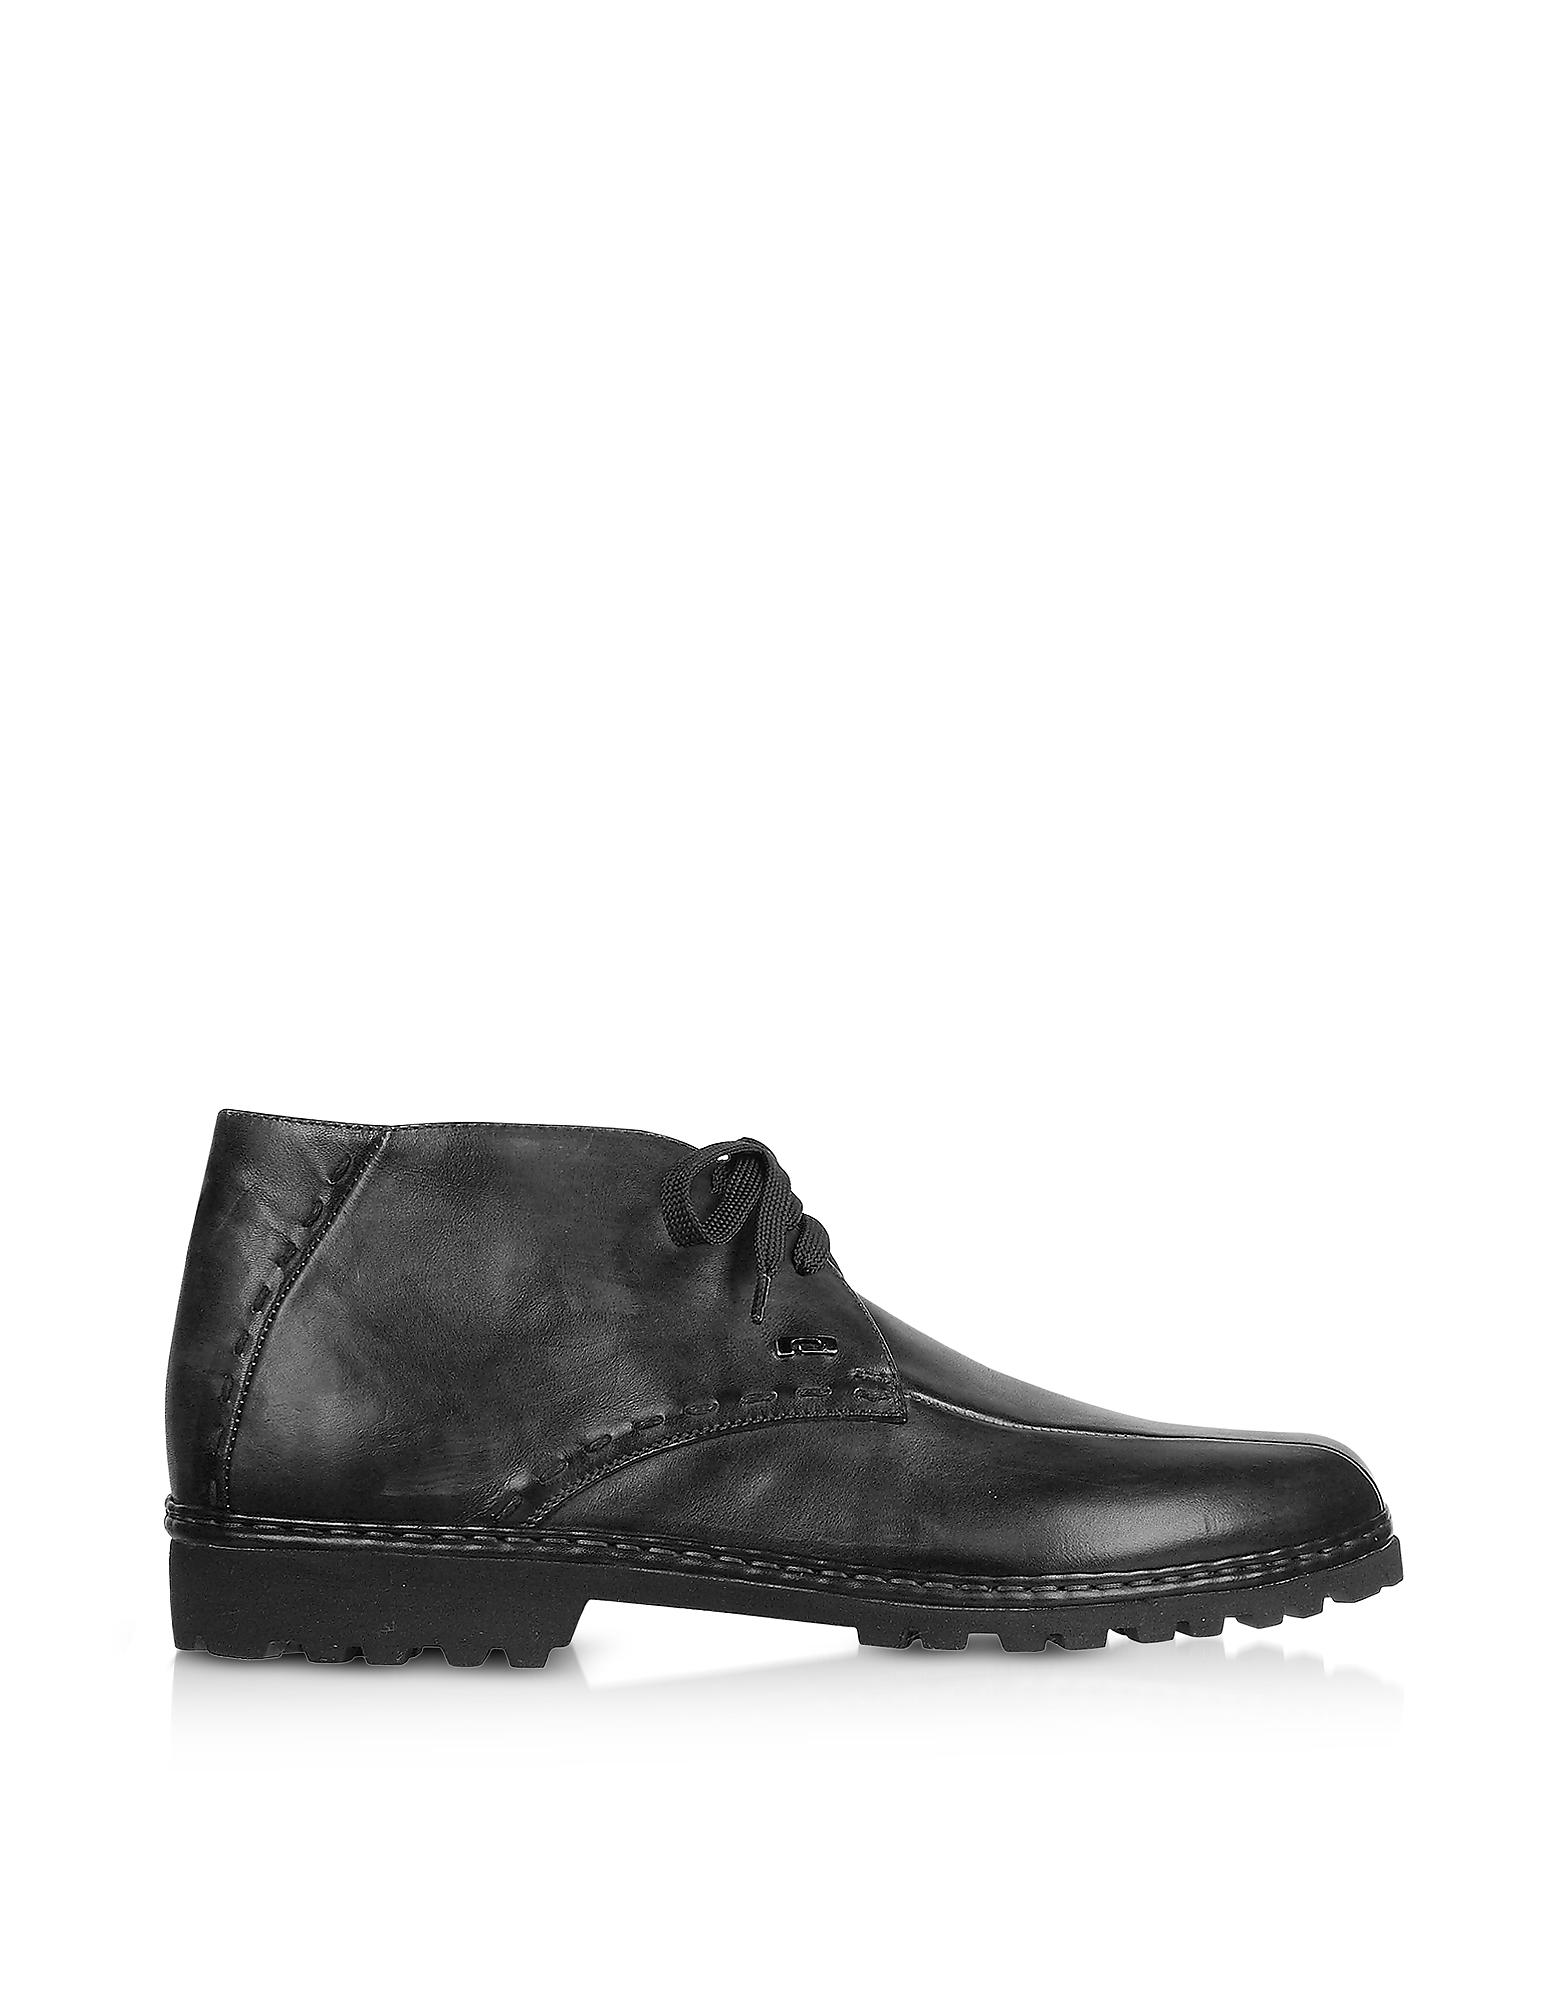 Black Handmade Italian Leather Ankle Boots